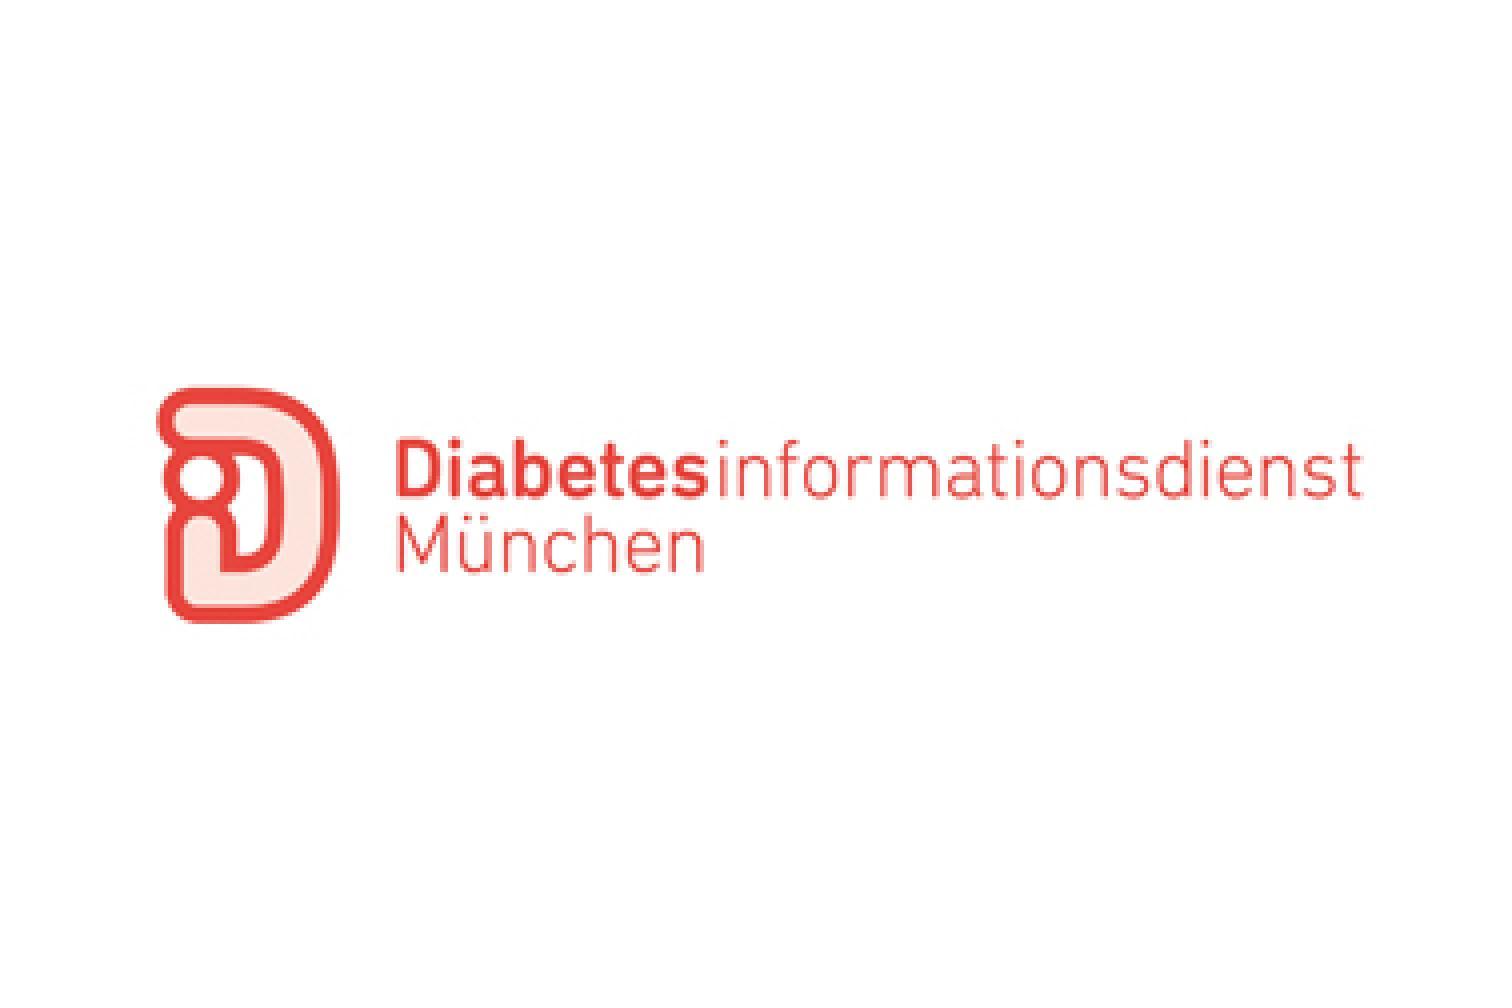 Logo Diabetesinformationsdienst